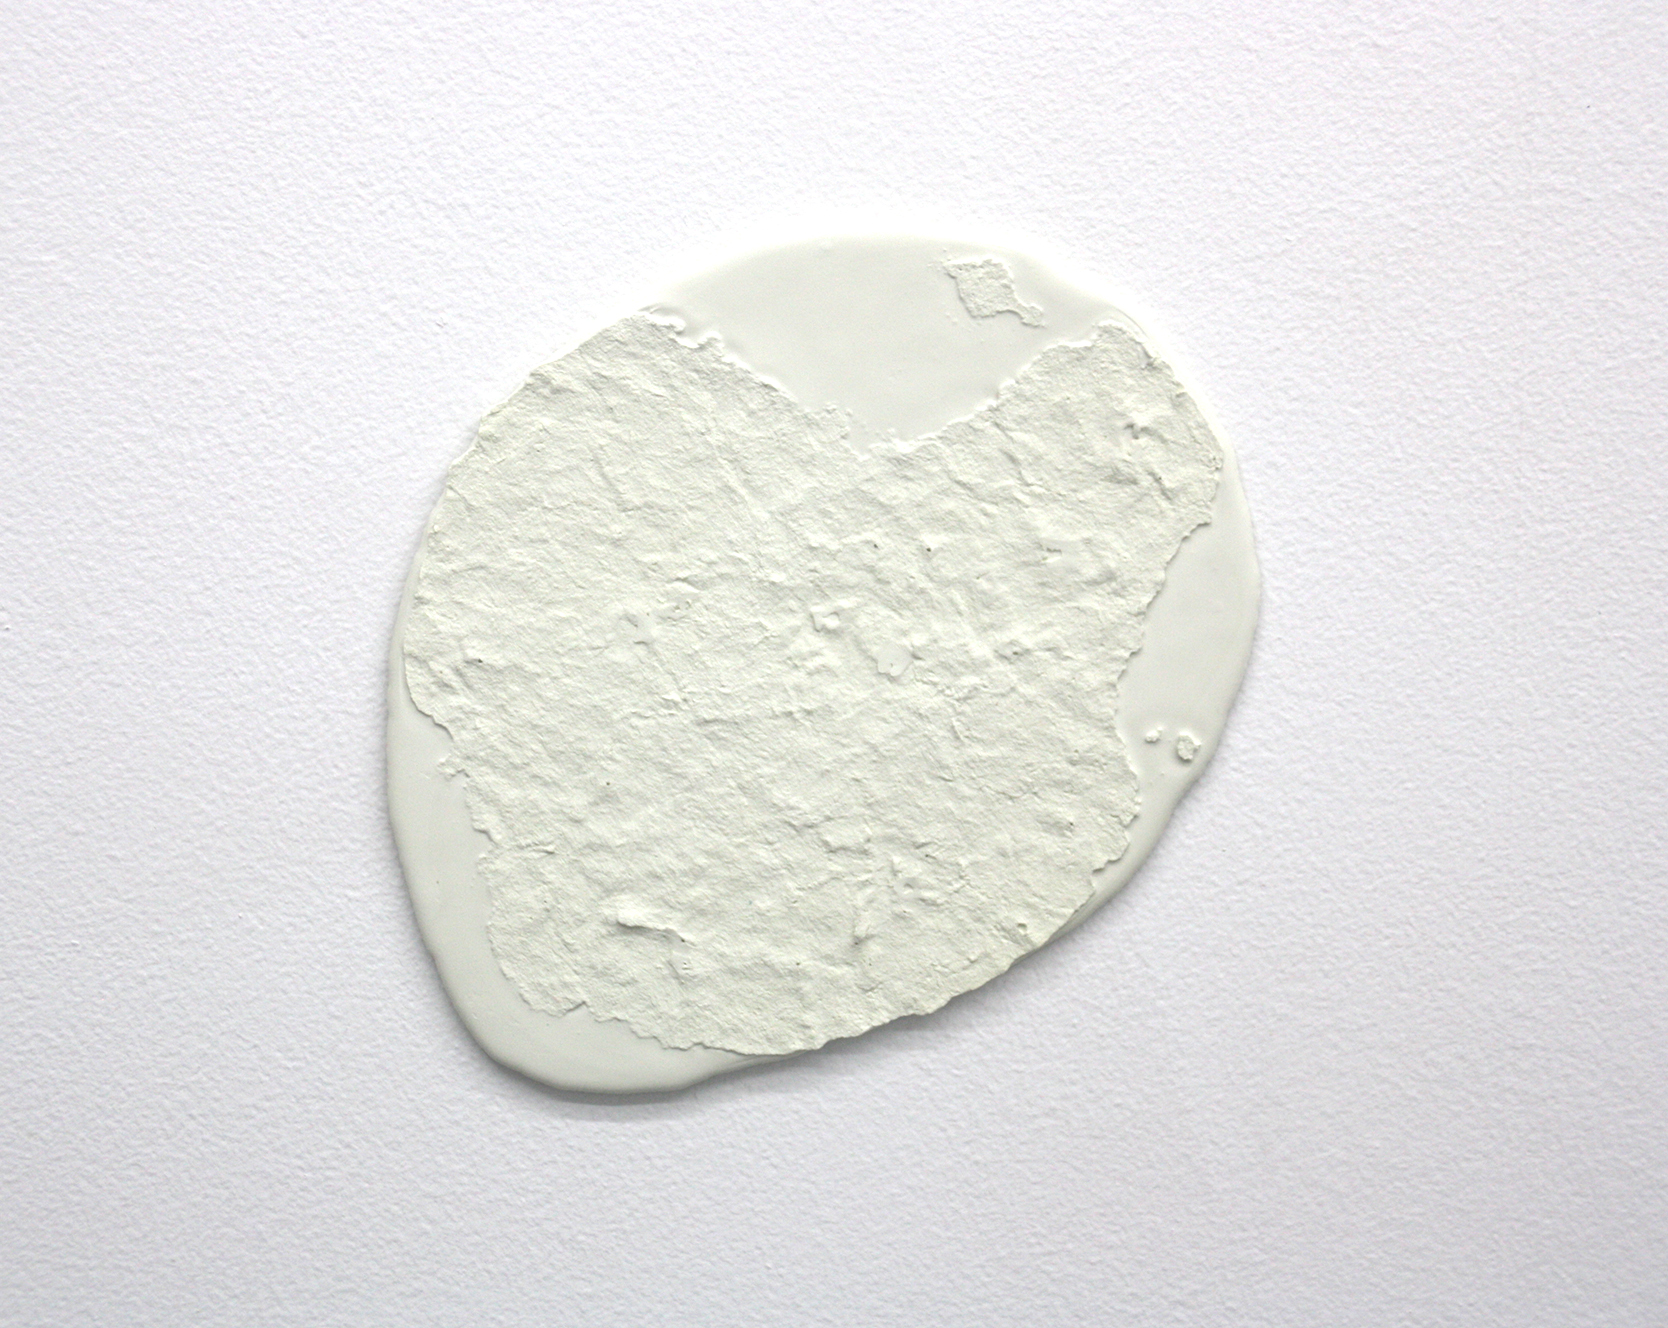 Madeleine Thornton-Smith, 'Limit', 2018, slip cast recycled paper, ceramic stain..jpg